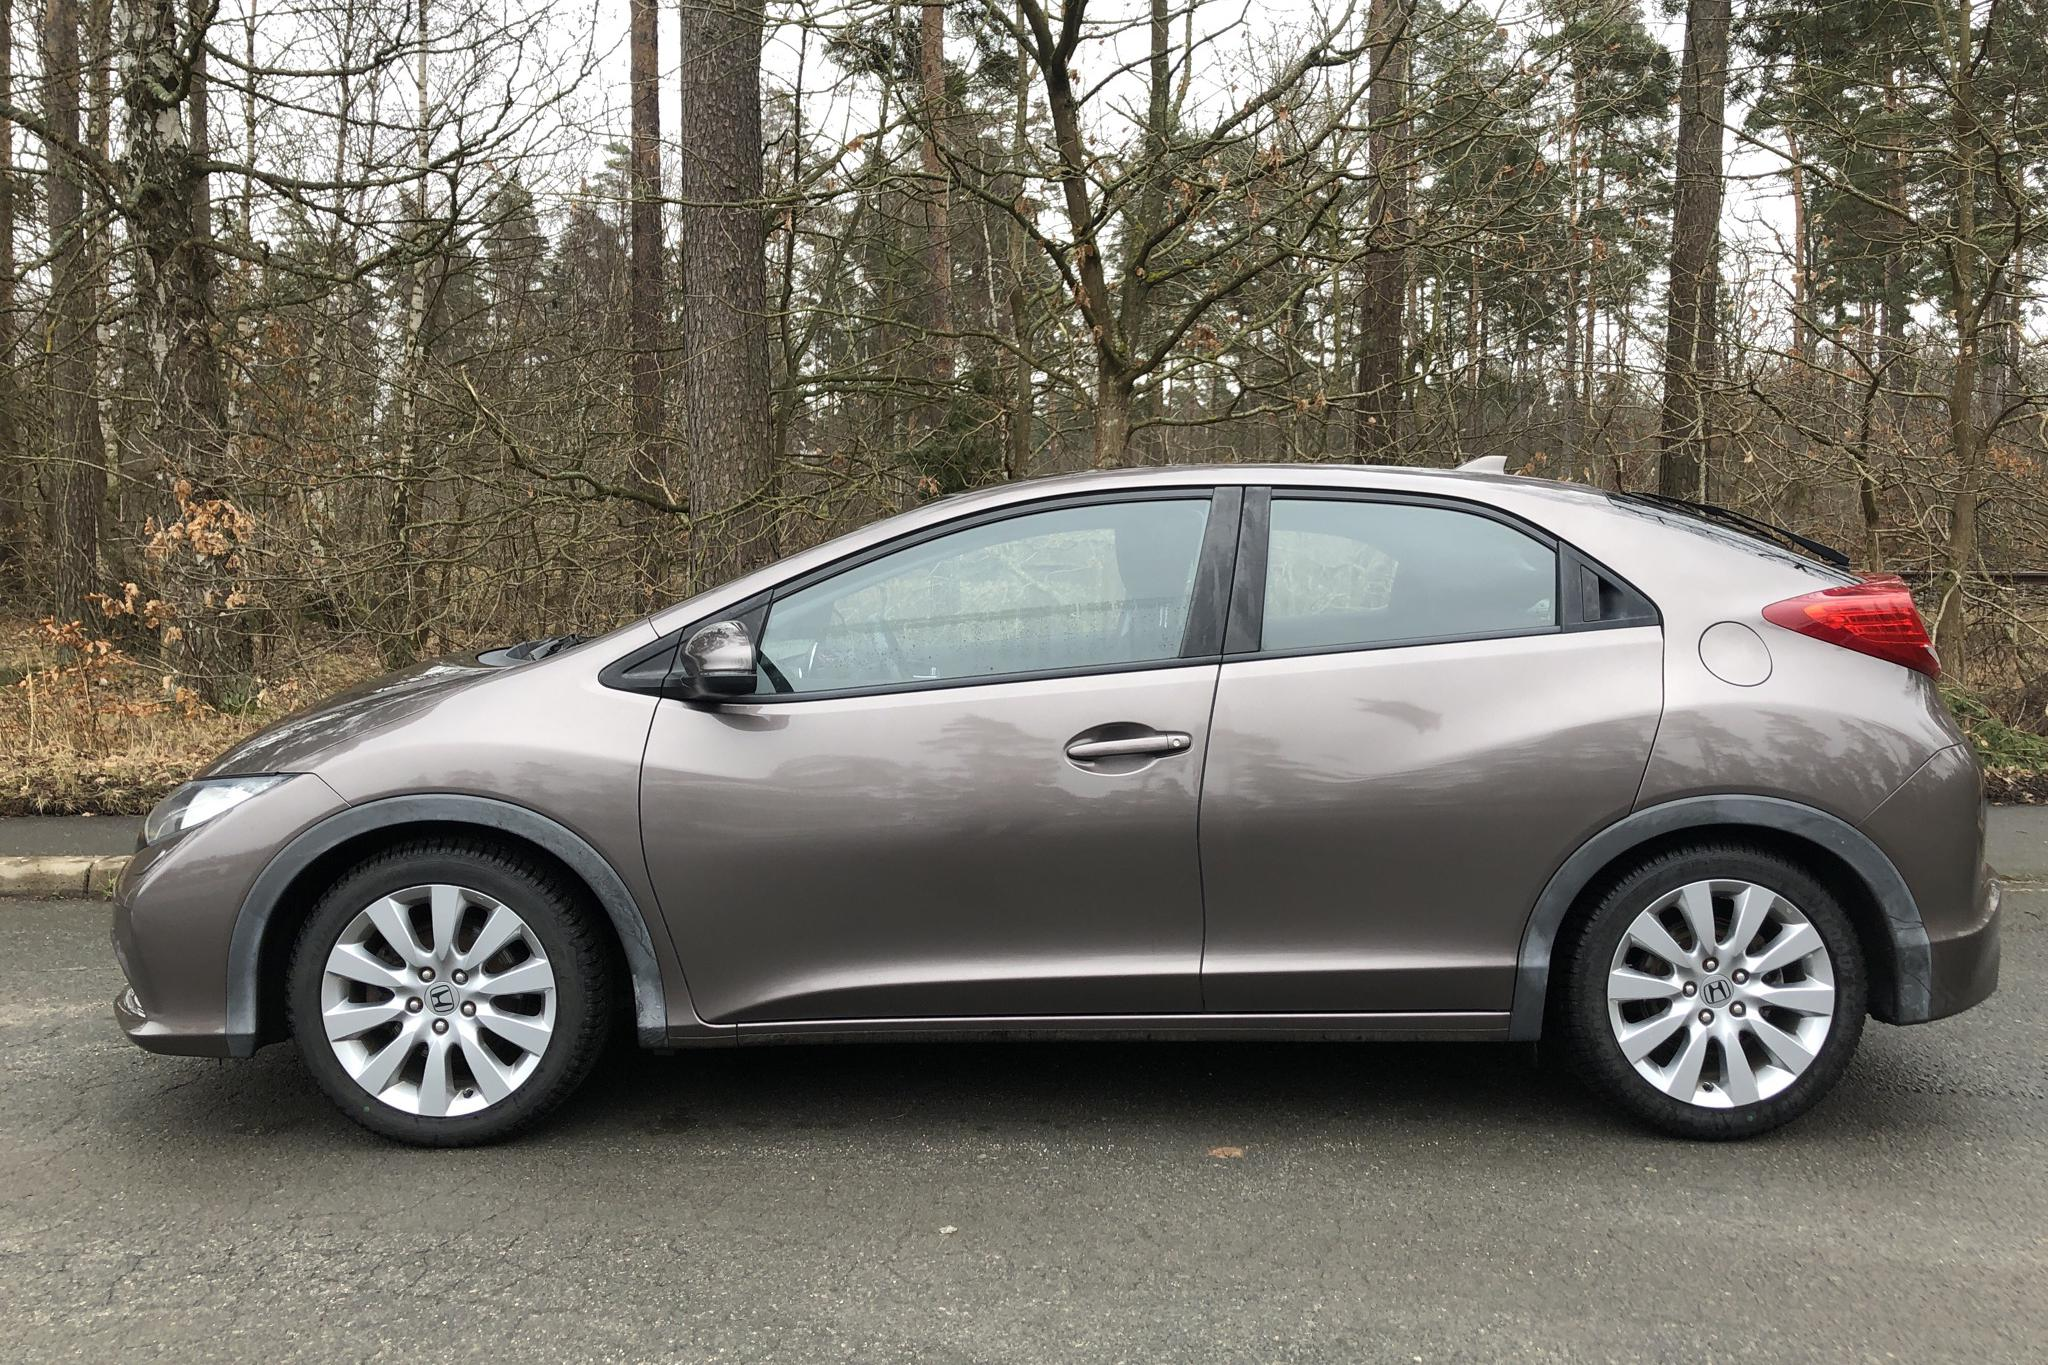 Honda Civic 1.8 i-VTEC 5dr (142hk) - 11 561 mil - Manuell - grå - 2012